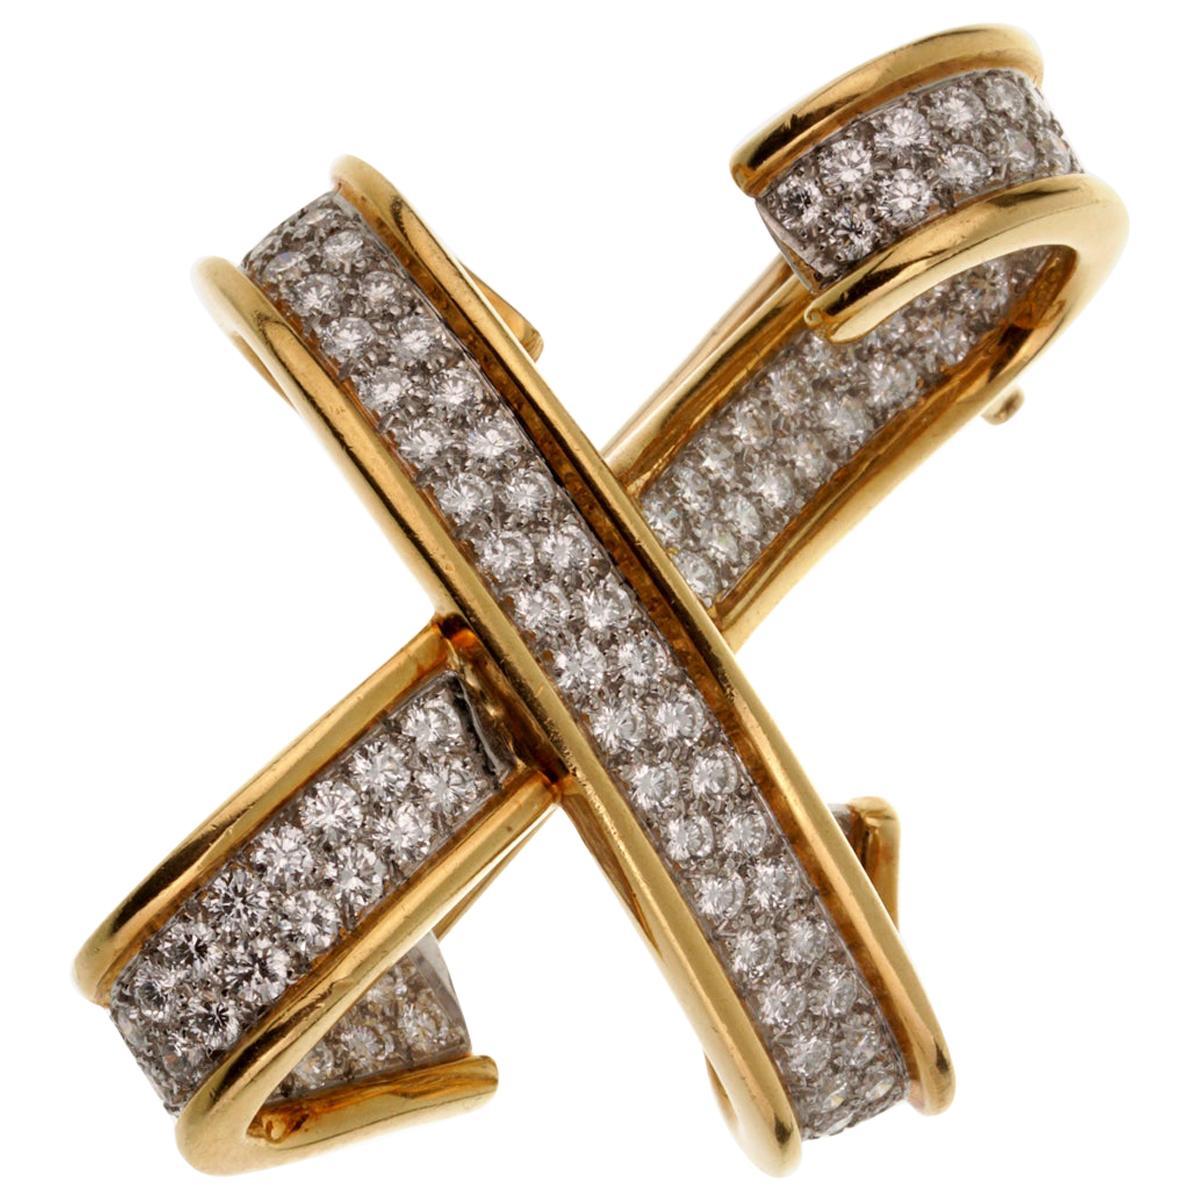 Tiffany & Co. Paloma Picasso Diamond X Brooch